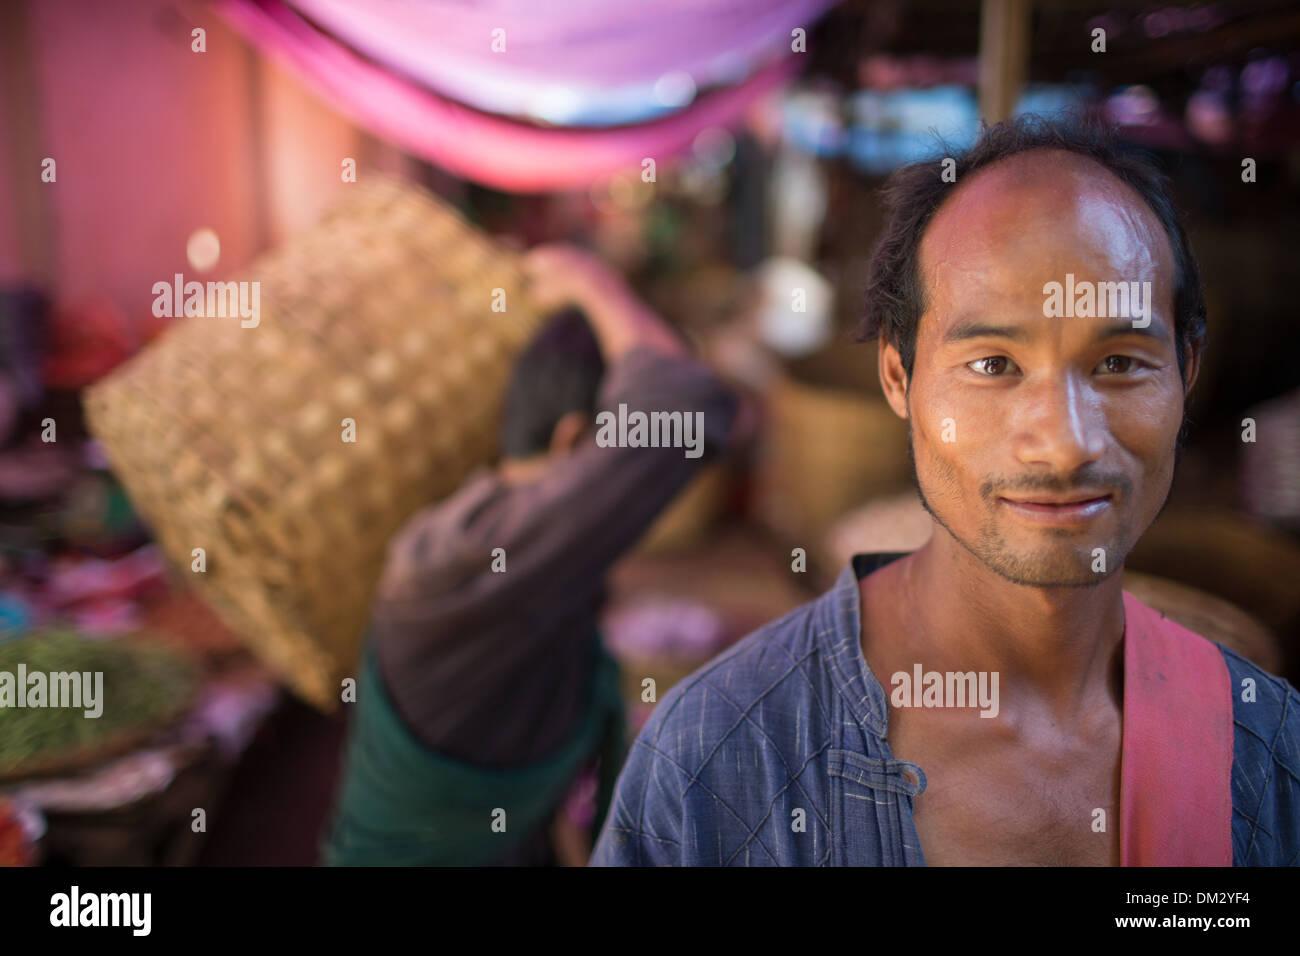 Le marché à Pyin Oo Lwin, Highland Shan, Myanmar (Birmanie) Photo Stock